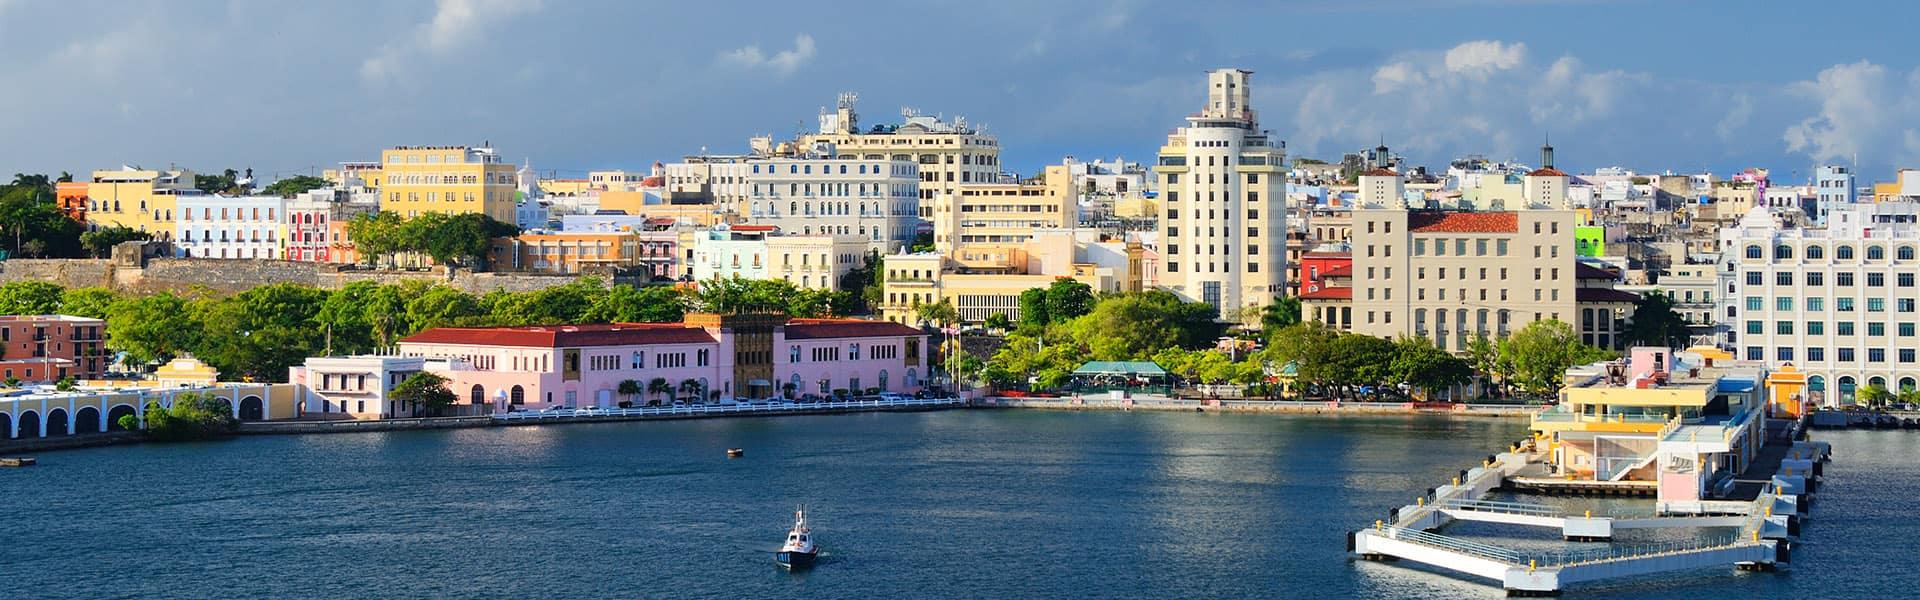 Caribbean: San Juan, St. Thomas & Great Stirrup Cay